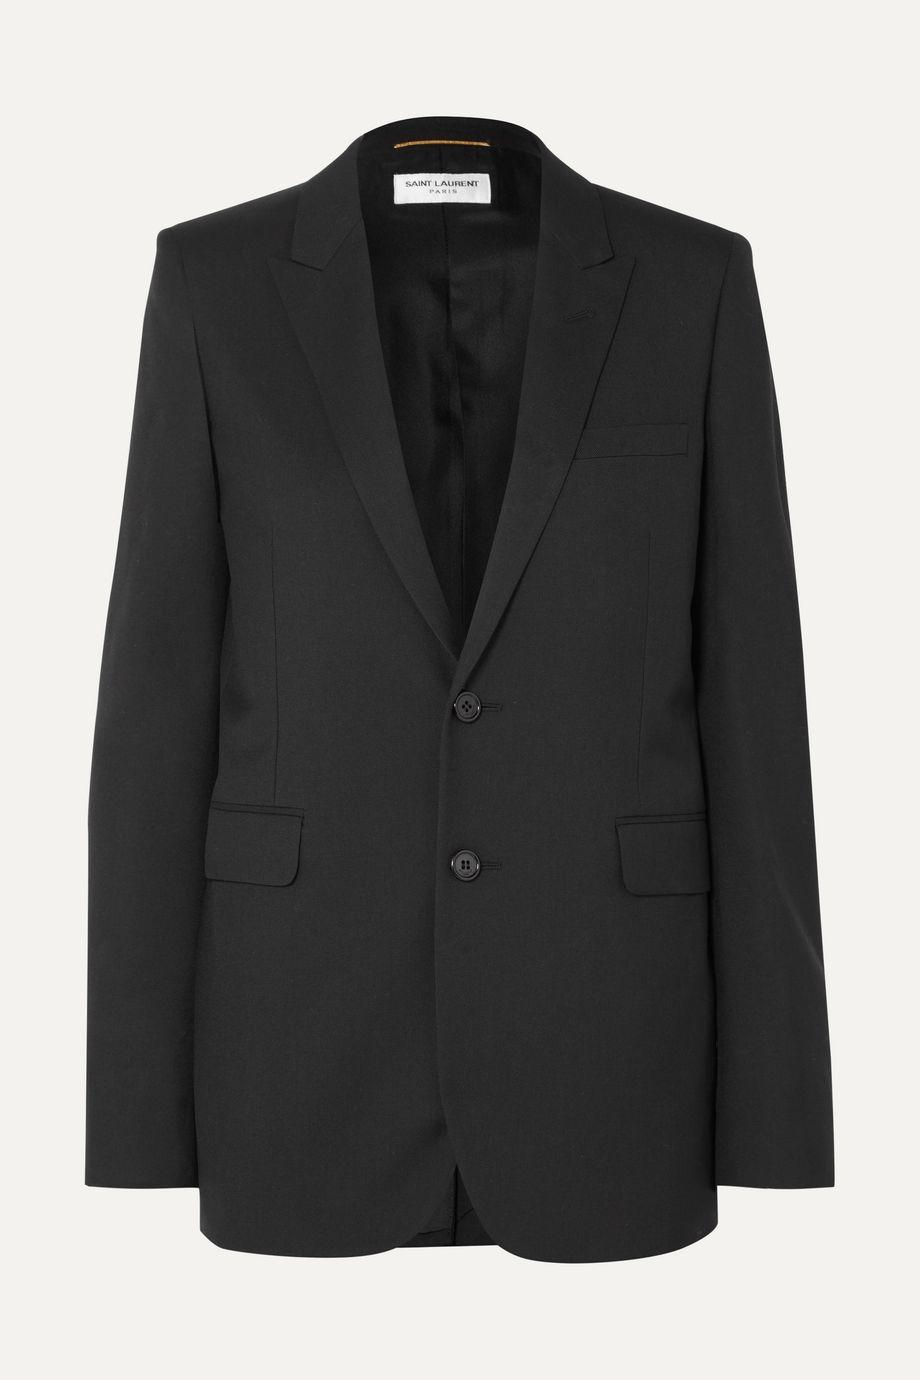 SAINT LAURENT 羊毛华达呢西装外套